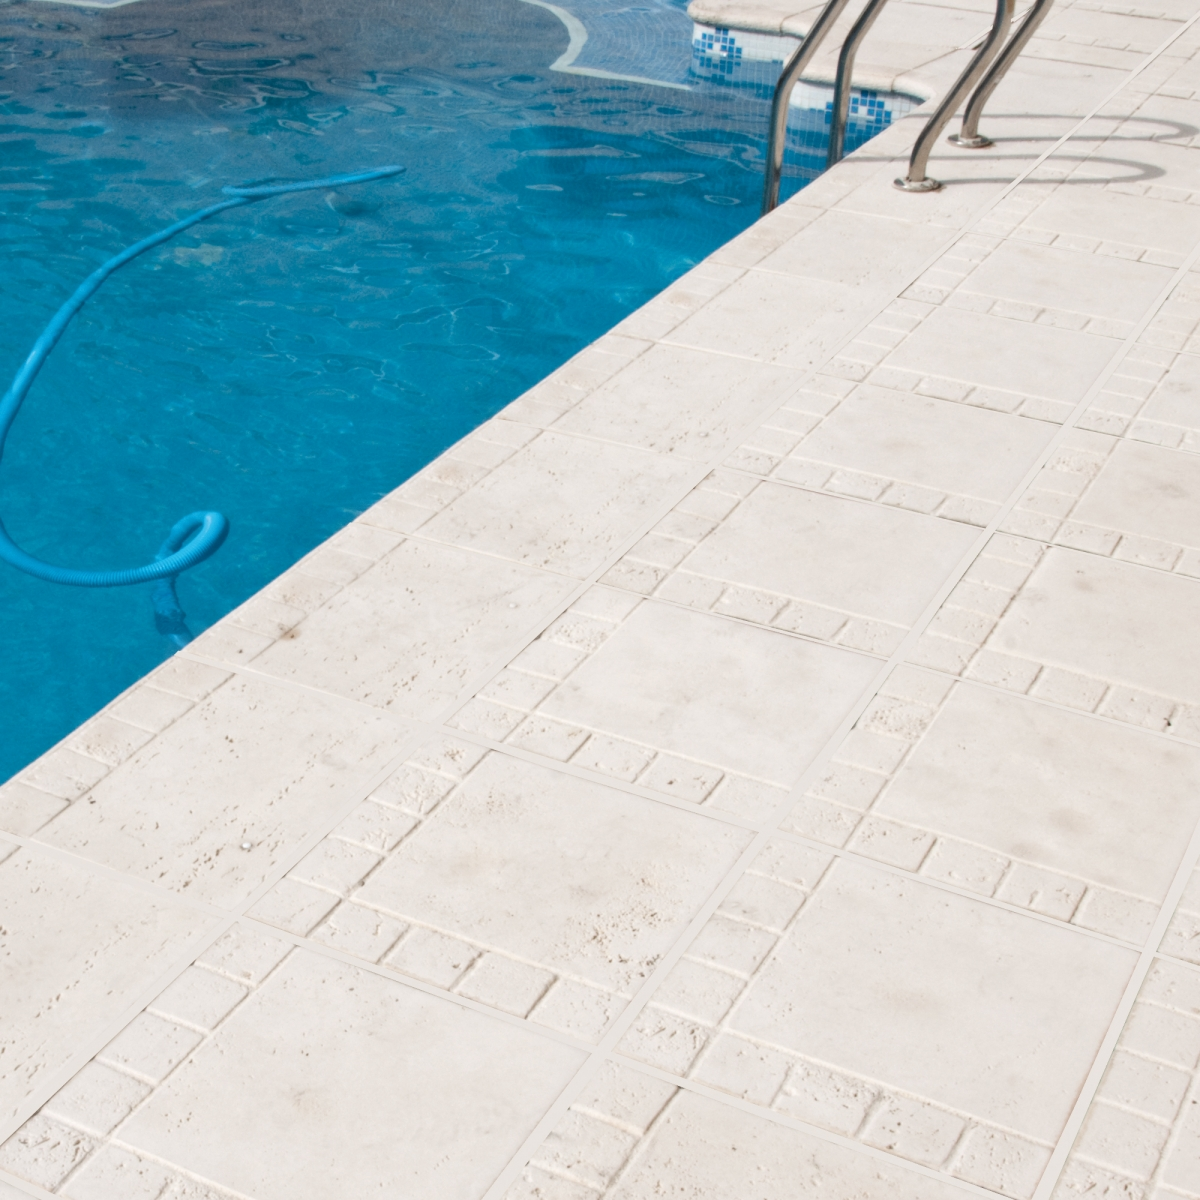 Borde de piscina Trena - Bordes de piscina - Marca Verniprens